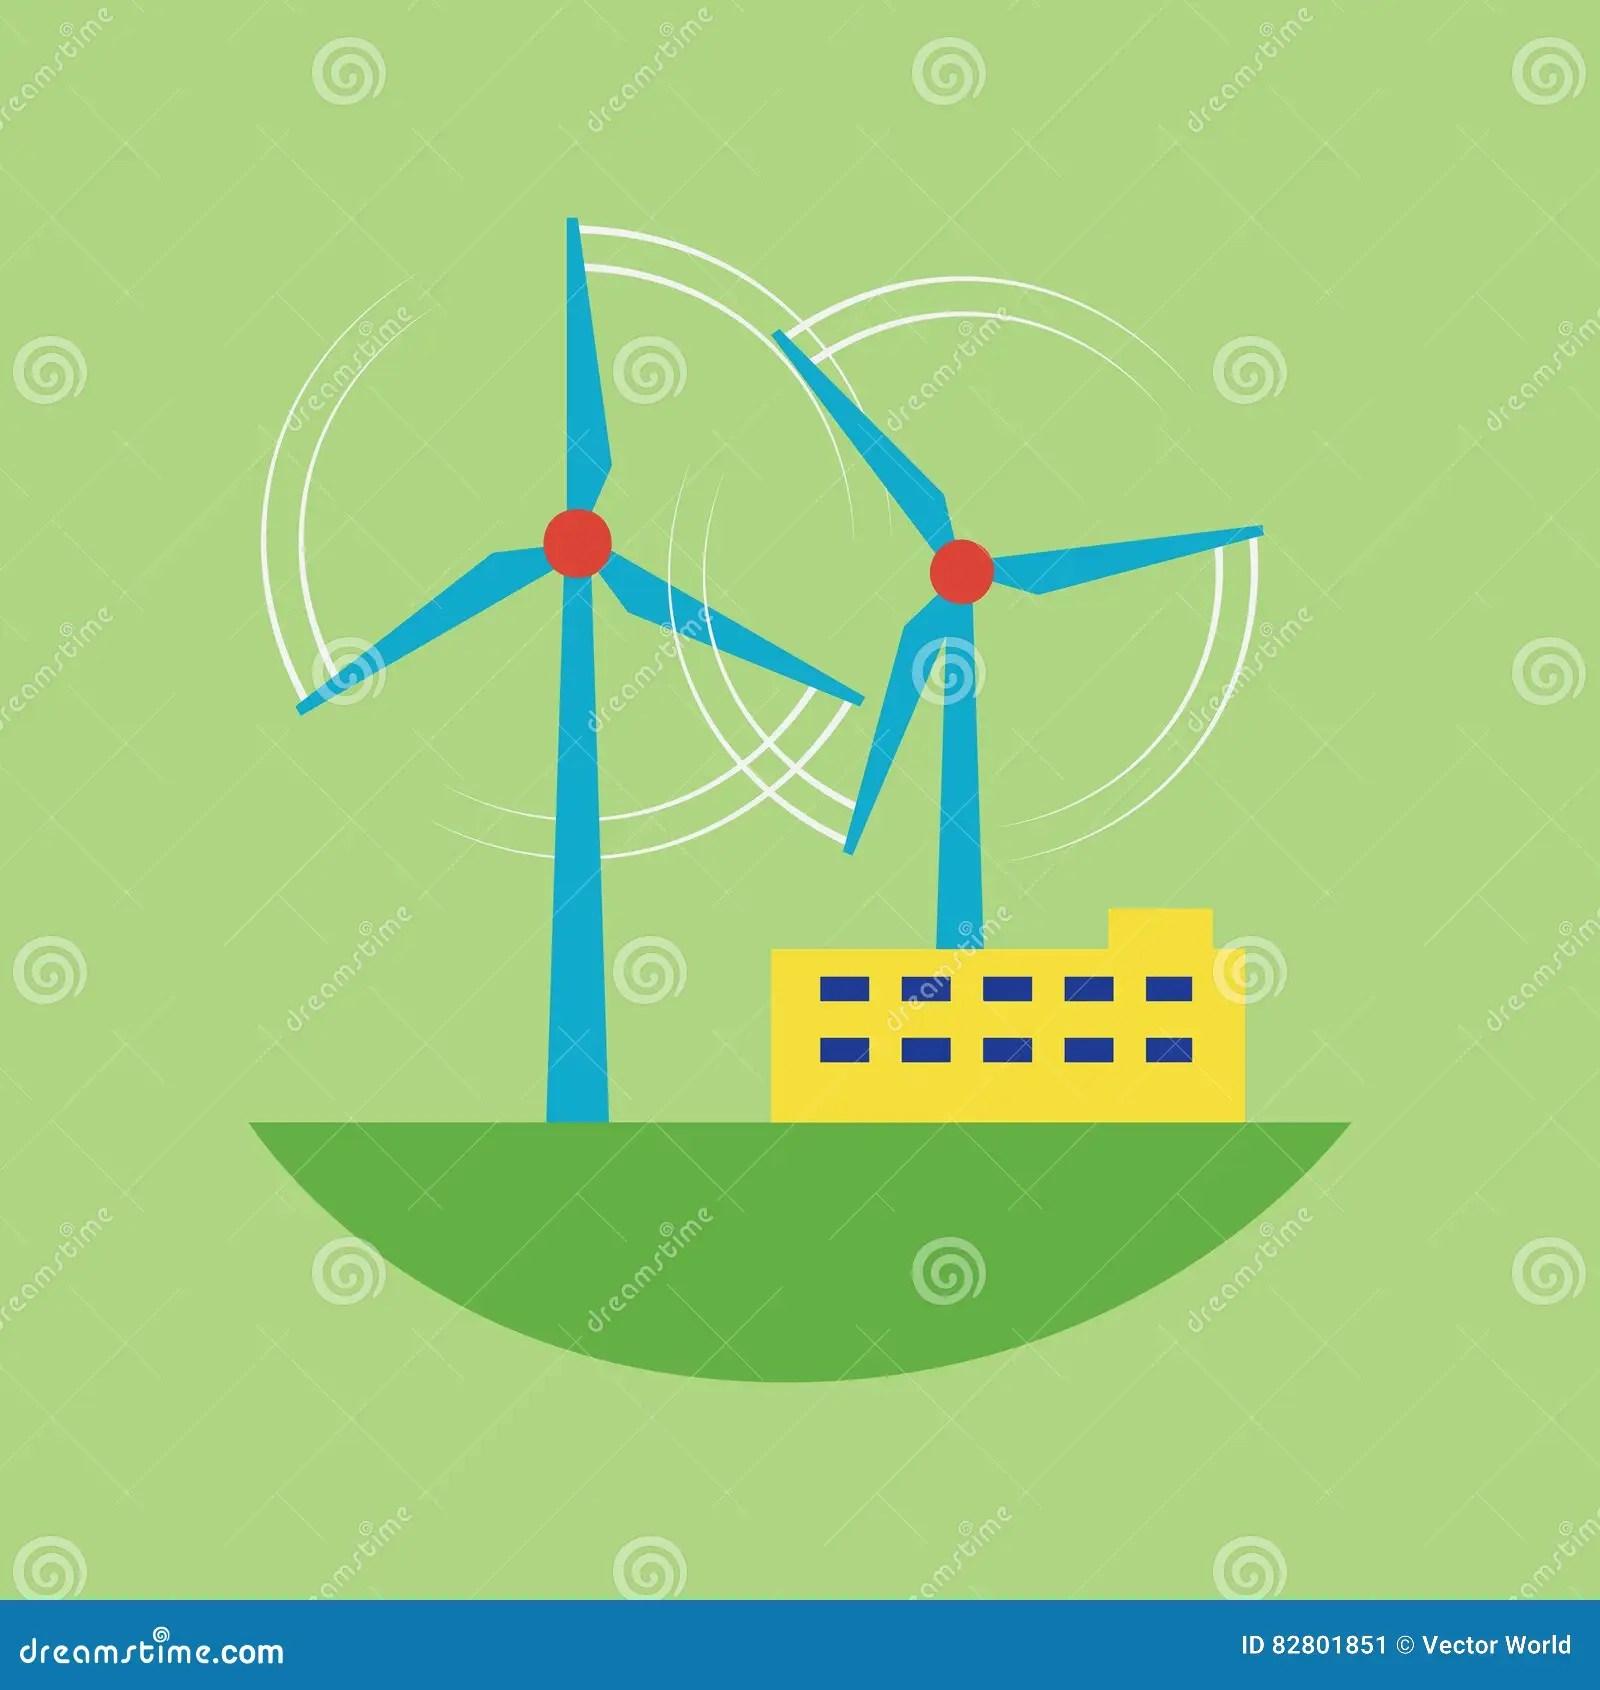 Alternative Energy Source Wind Station Vector Illustration